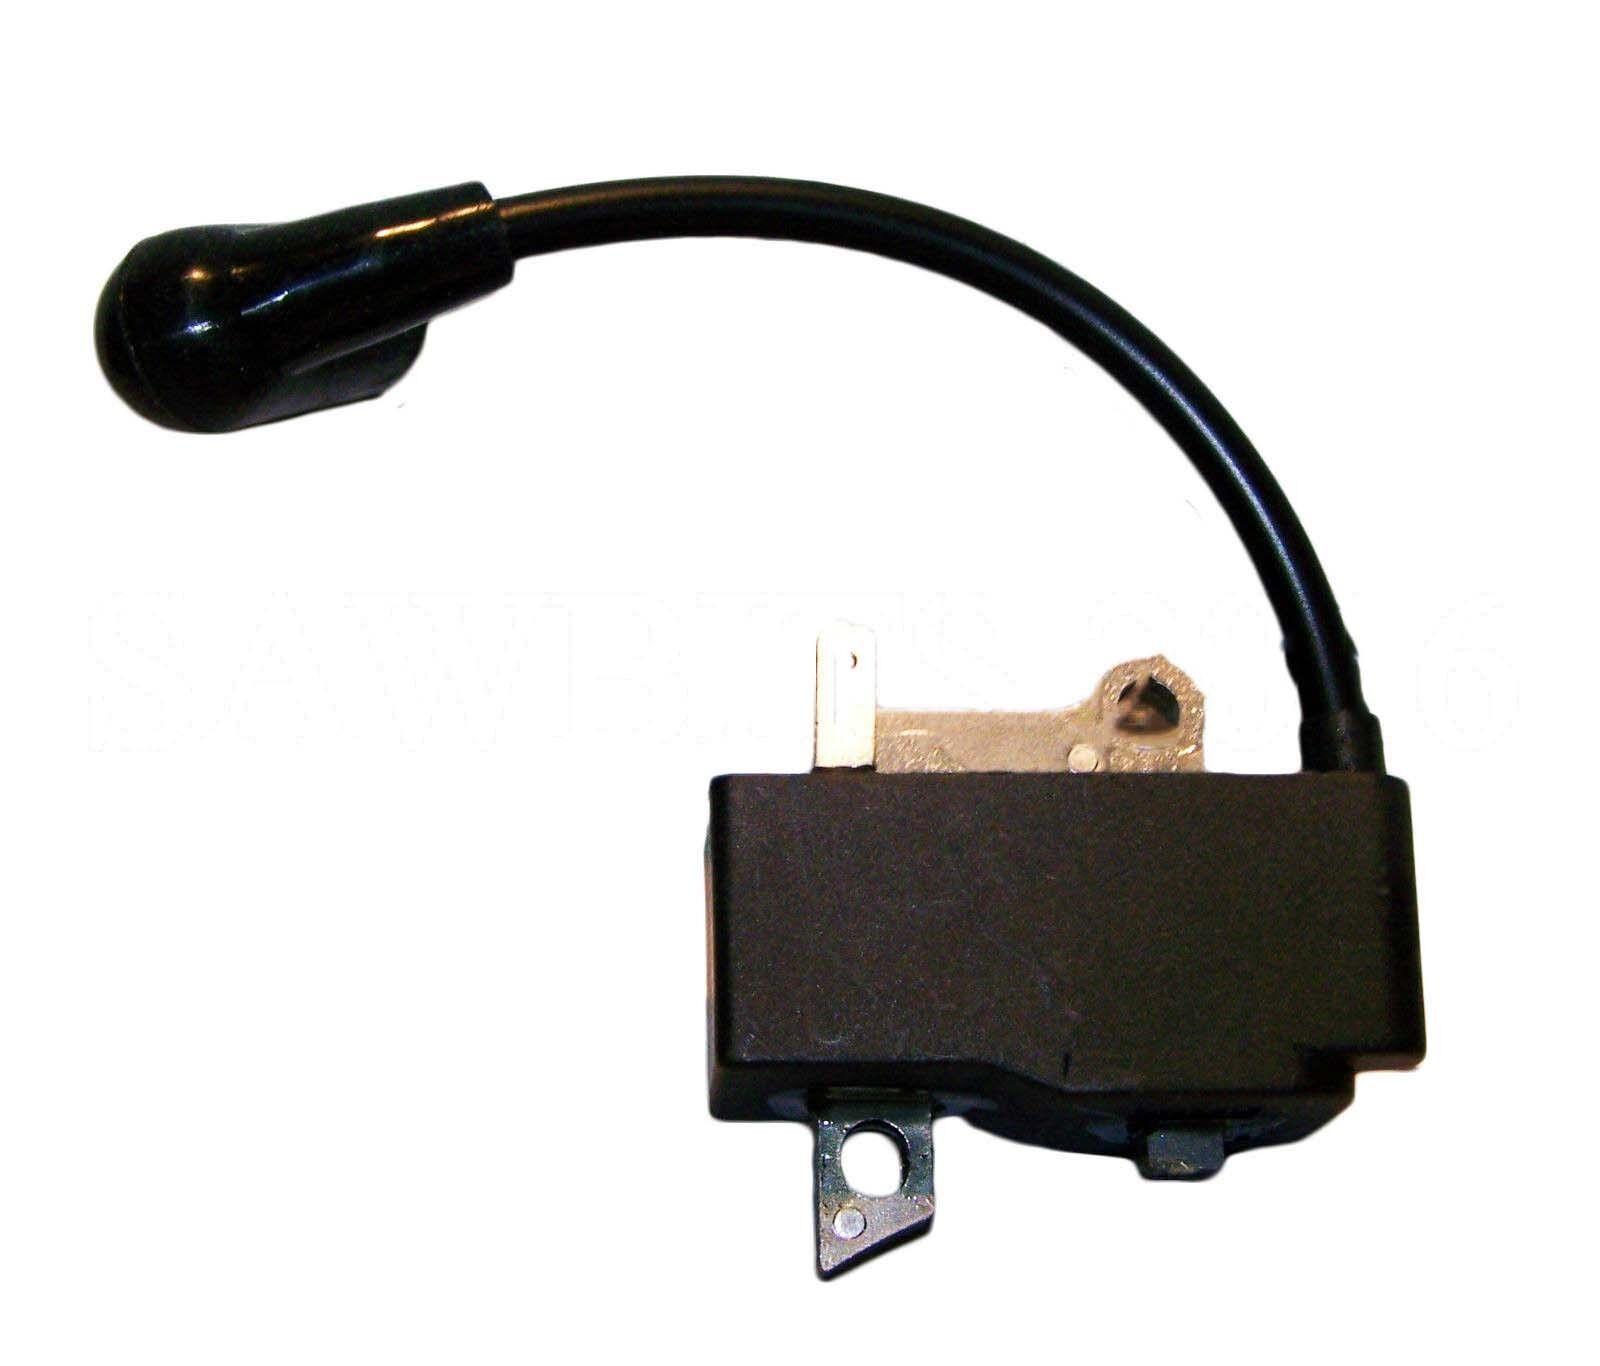 ignition coil for Husqvarna Chainsaws 435 440 445 450 Jonsered CS2245 CS2250